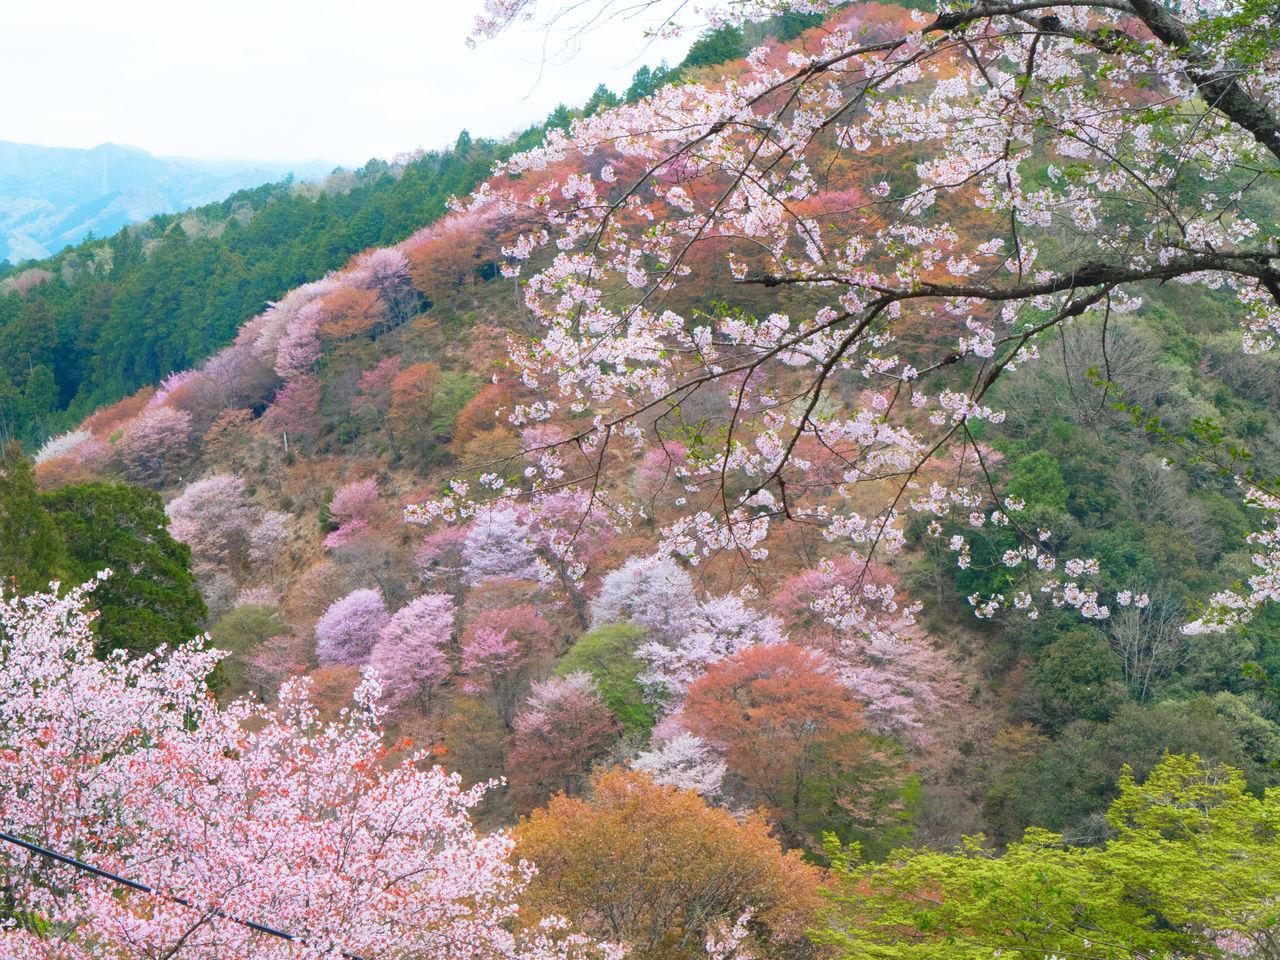 Вид на «нижнюю тысячу деревьев» симо-сэмбон